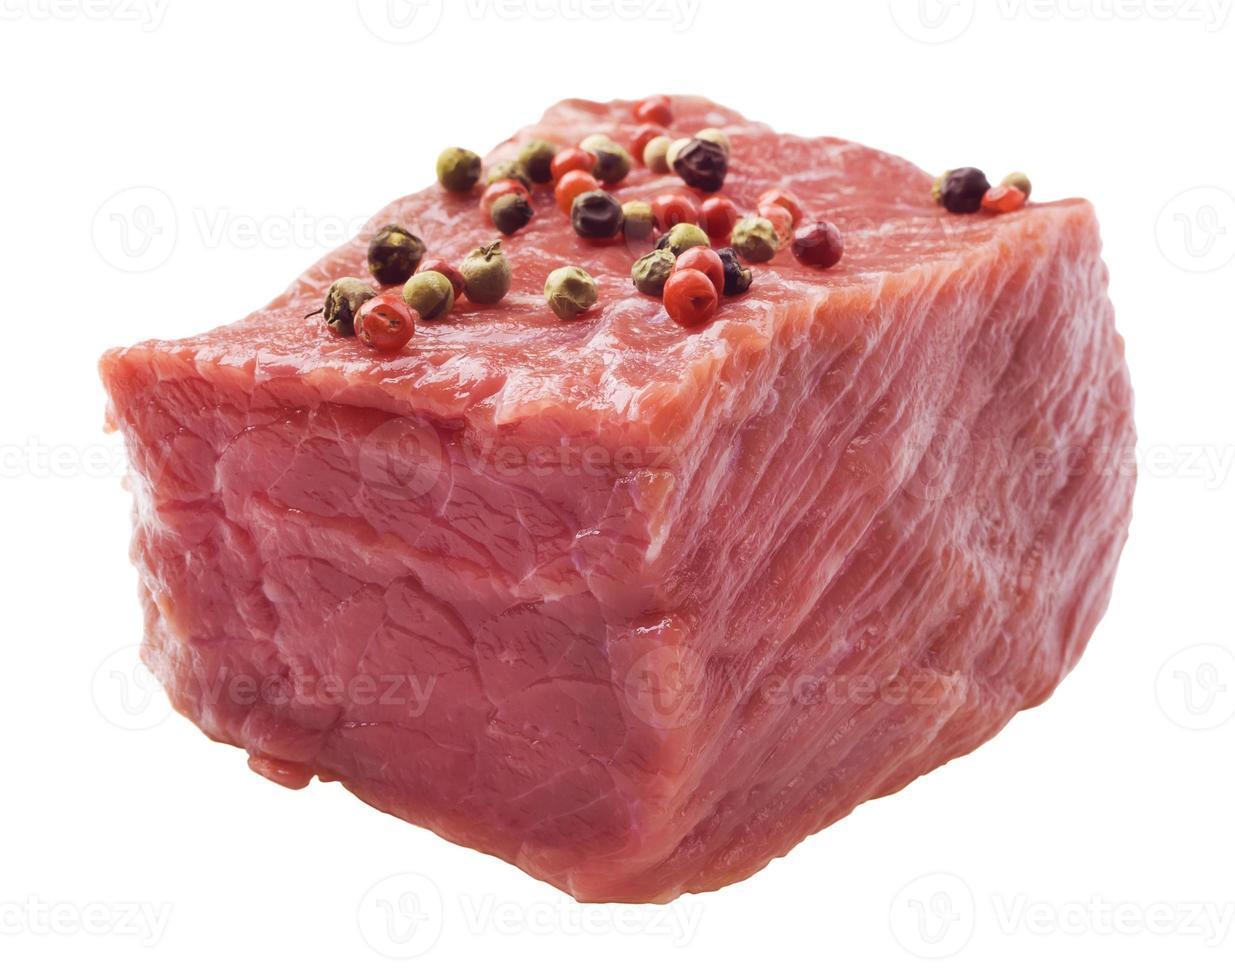 bistecca cruda al pepe foto